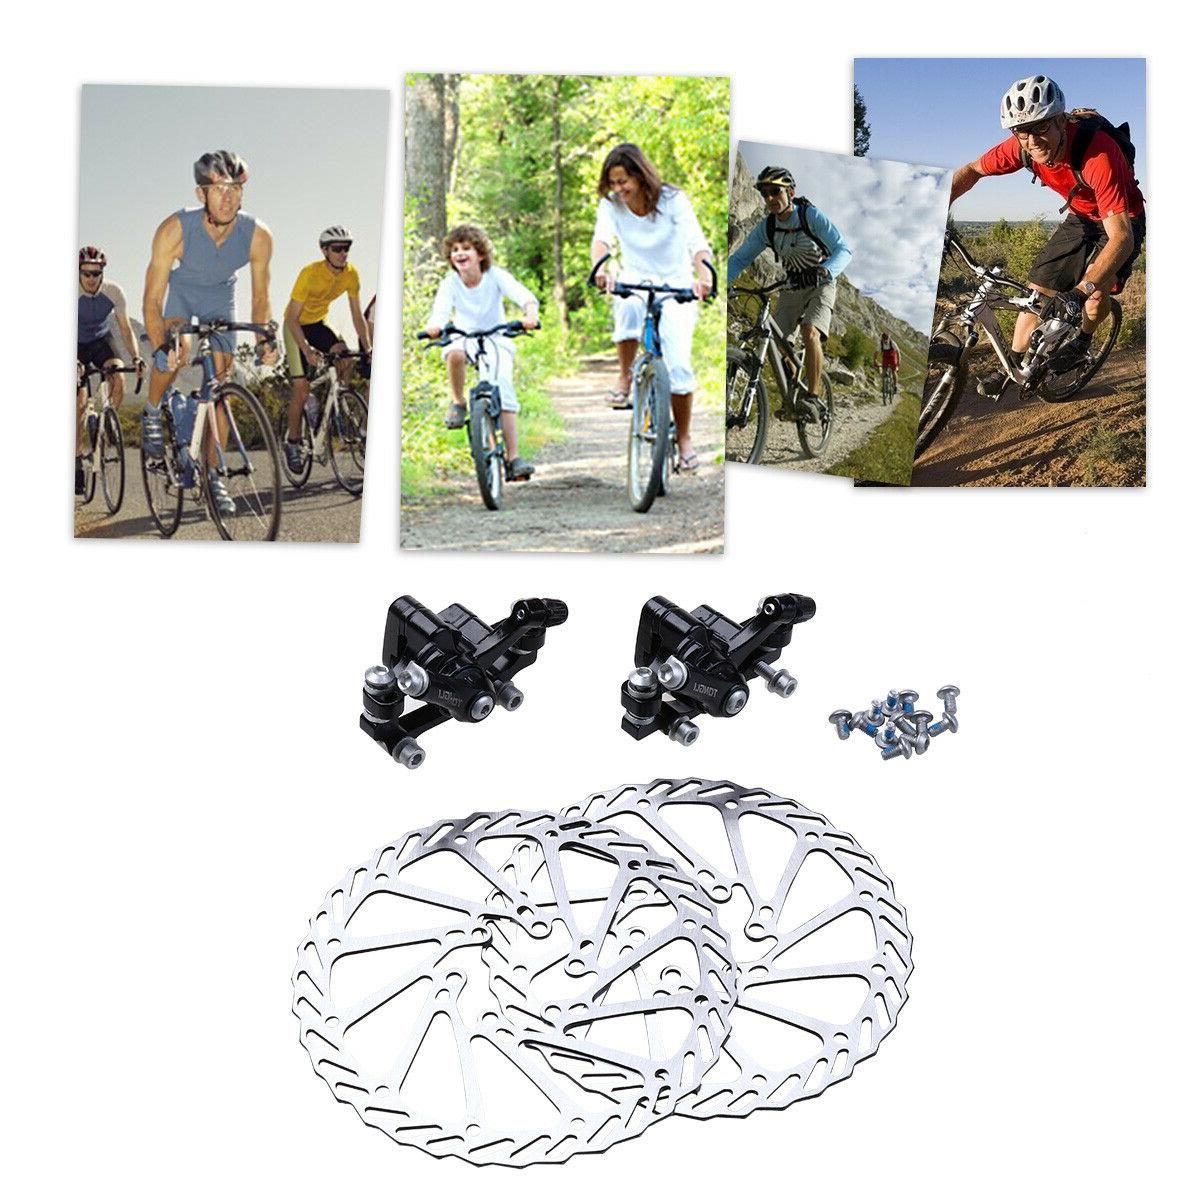 1 Mountain Bicycle Disc Caliper Rotor Rear